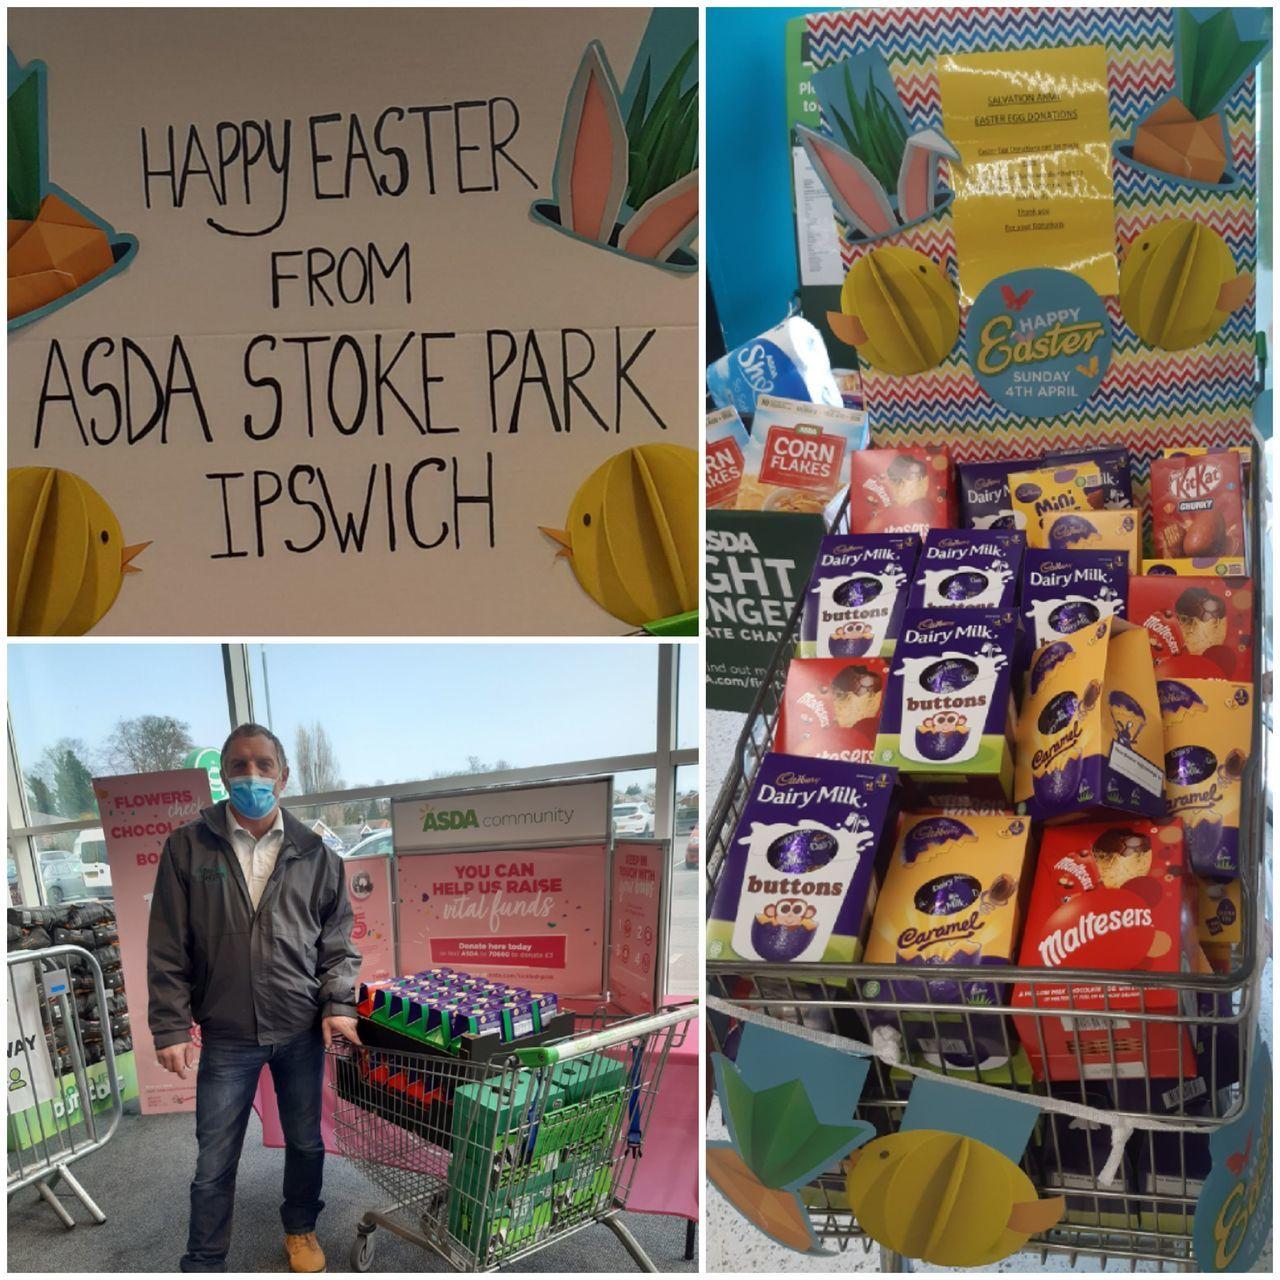 Happy Easter from Stoke Park Ipswich | Asda Ipswich Stoke Park